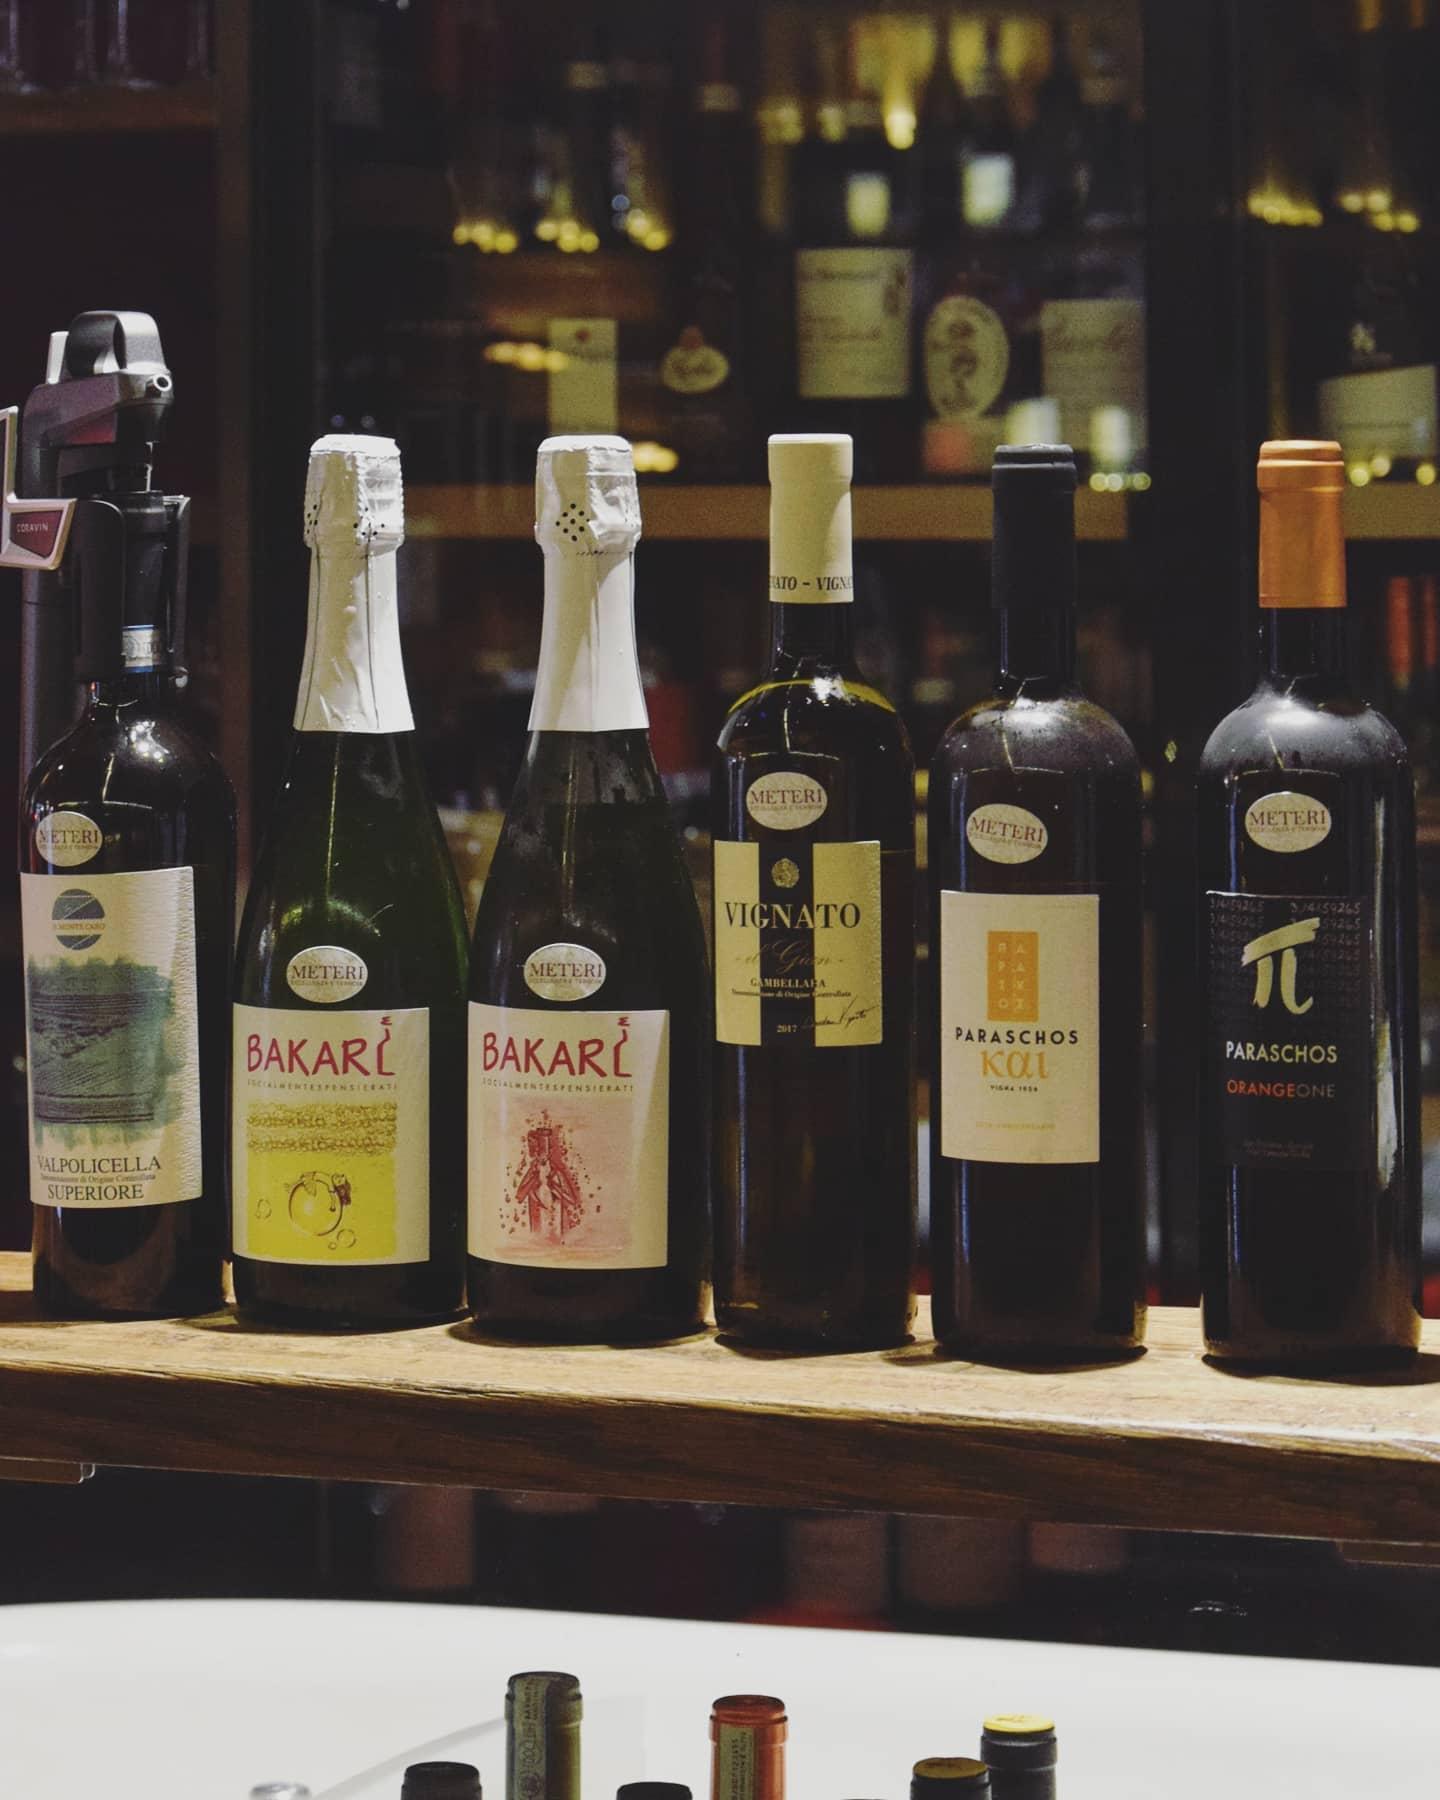 Vini Naturali da degustare a Vineria all'Amarone Venezia